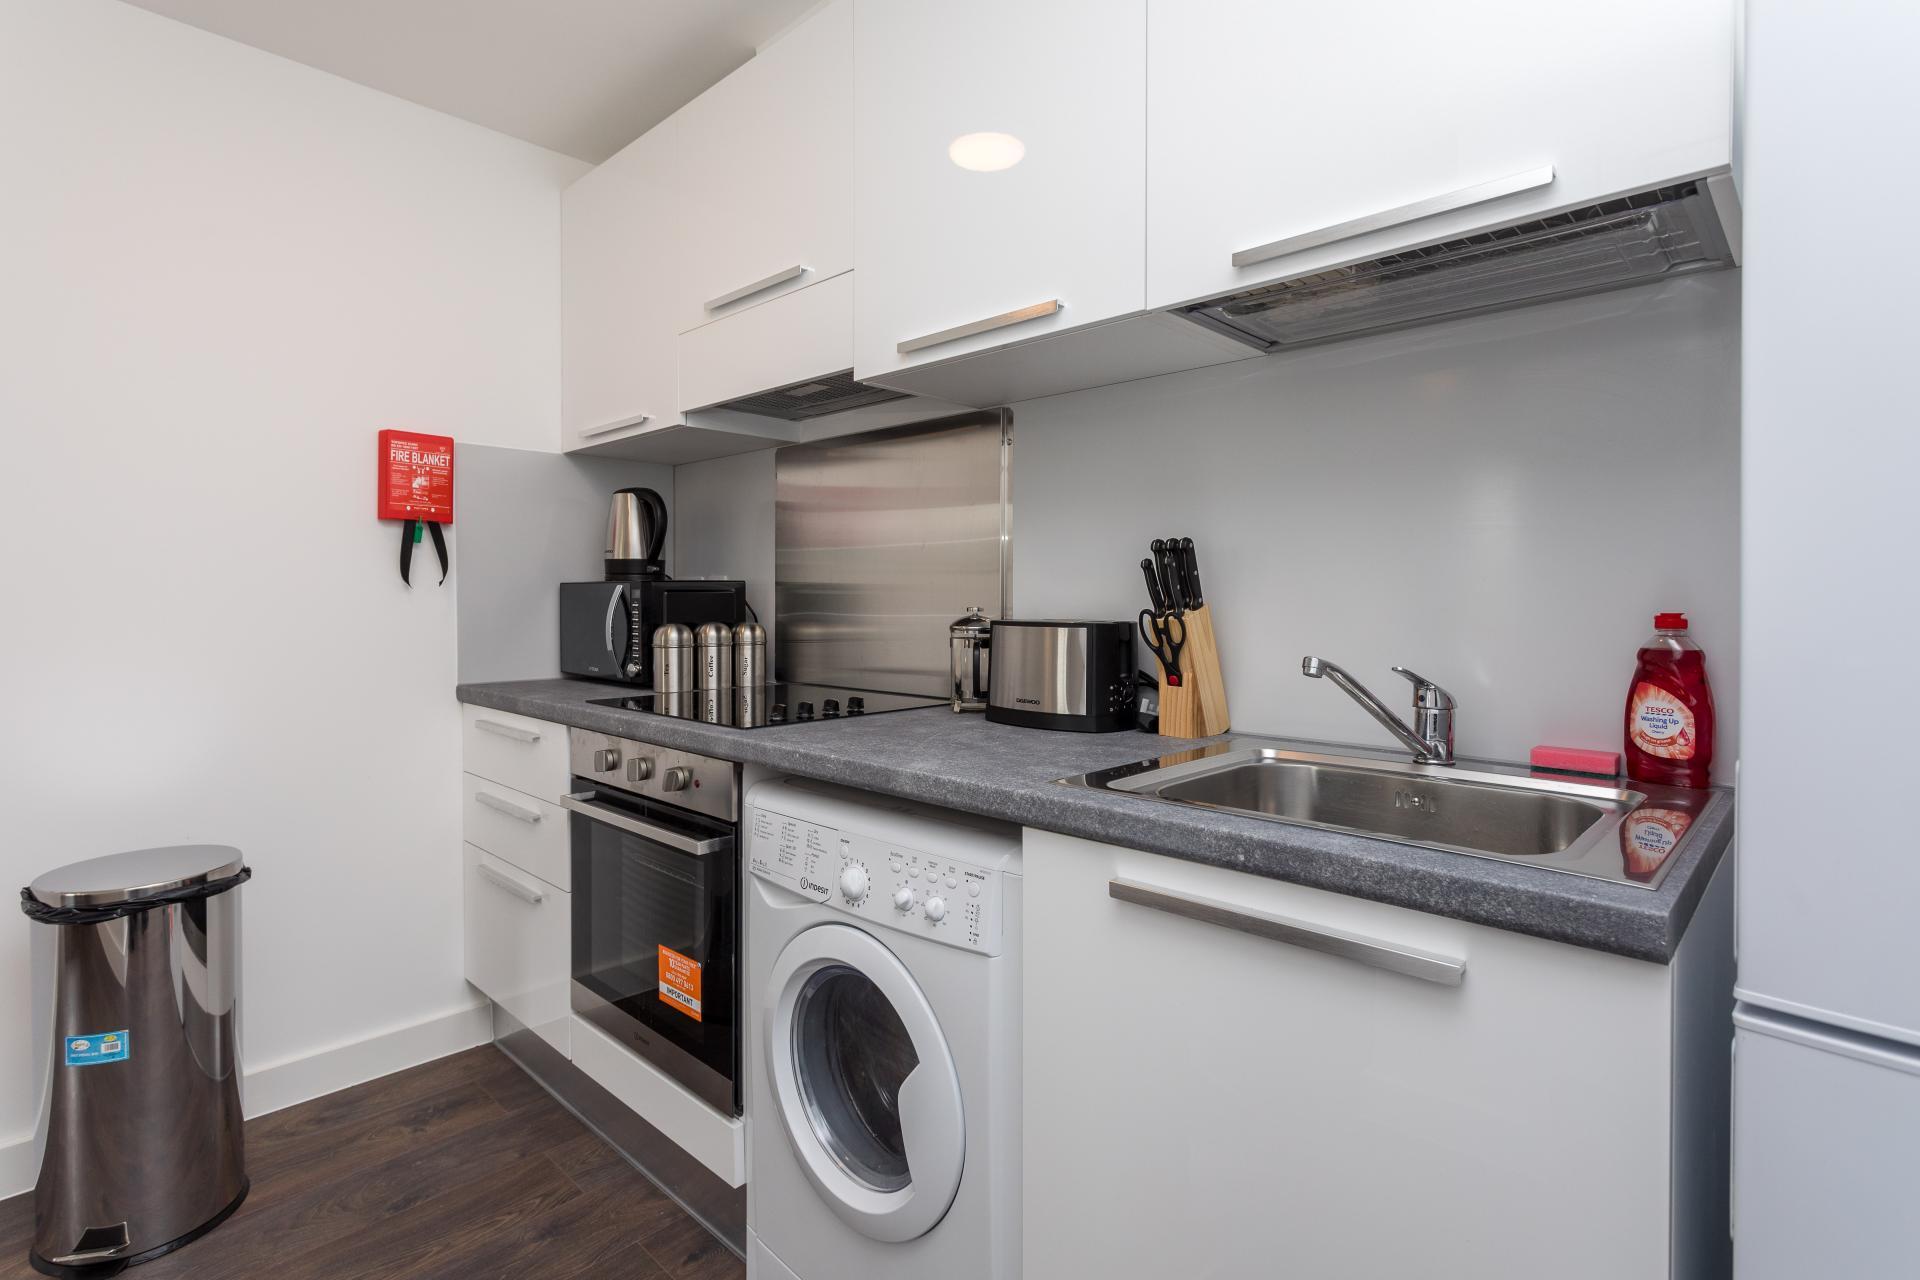 Kitchen at Sutherland Quarters, Three Bridges, Crawley